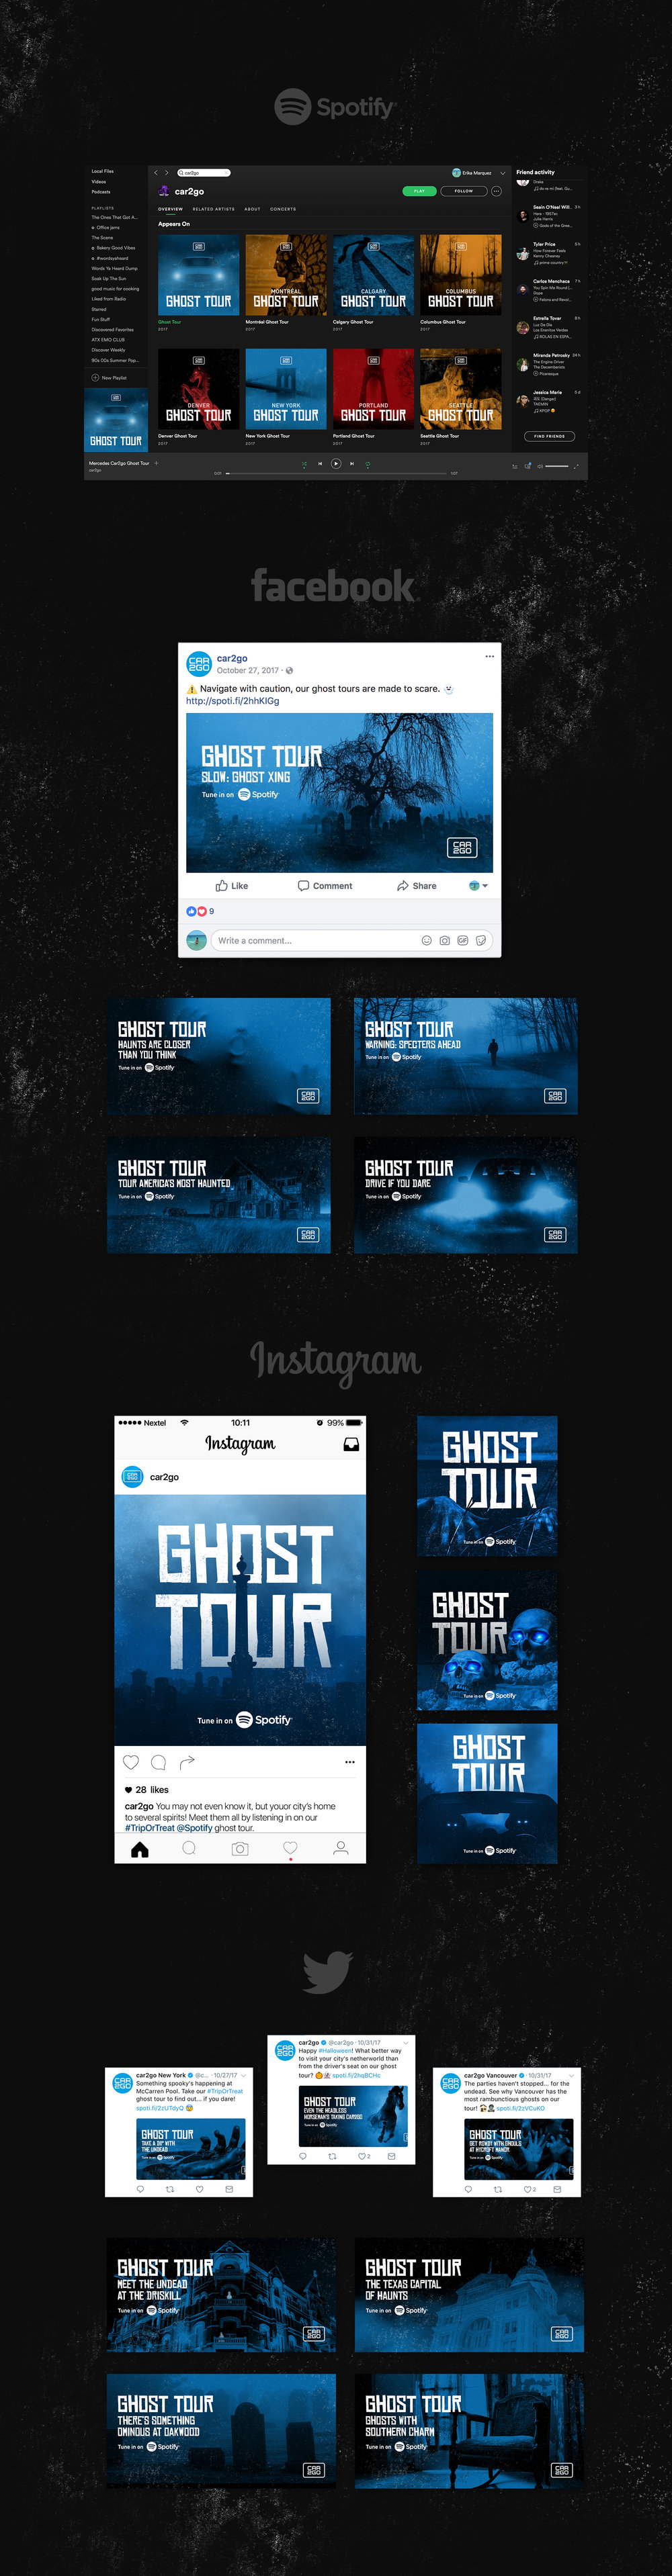 car2go_Halloween_Spotify-Ghost_Social.jpg